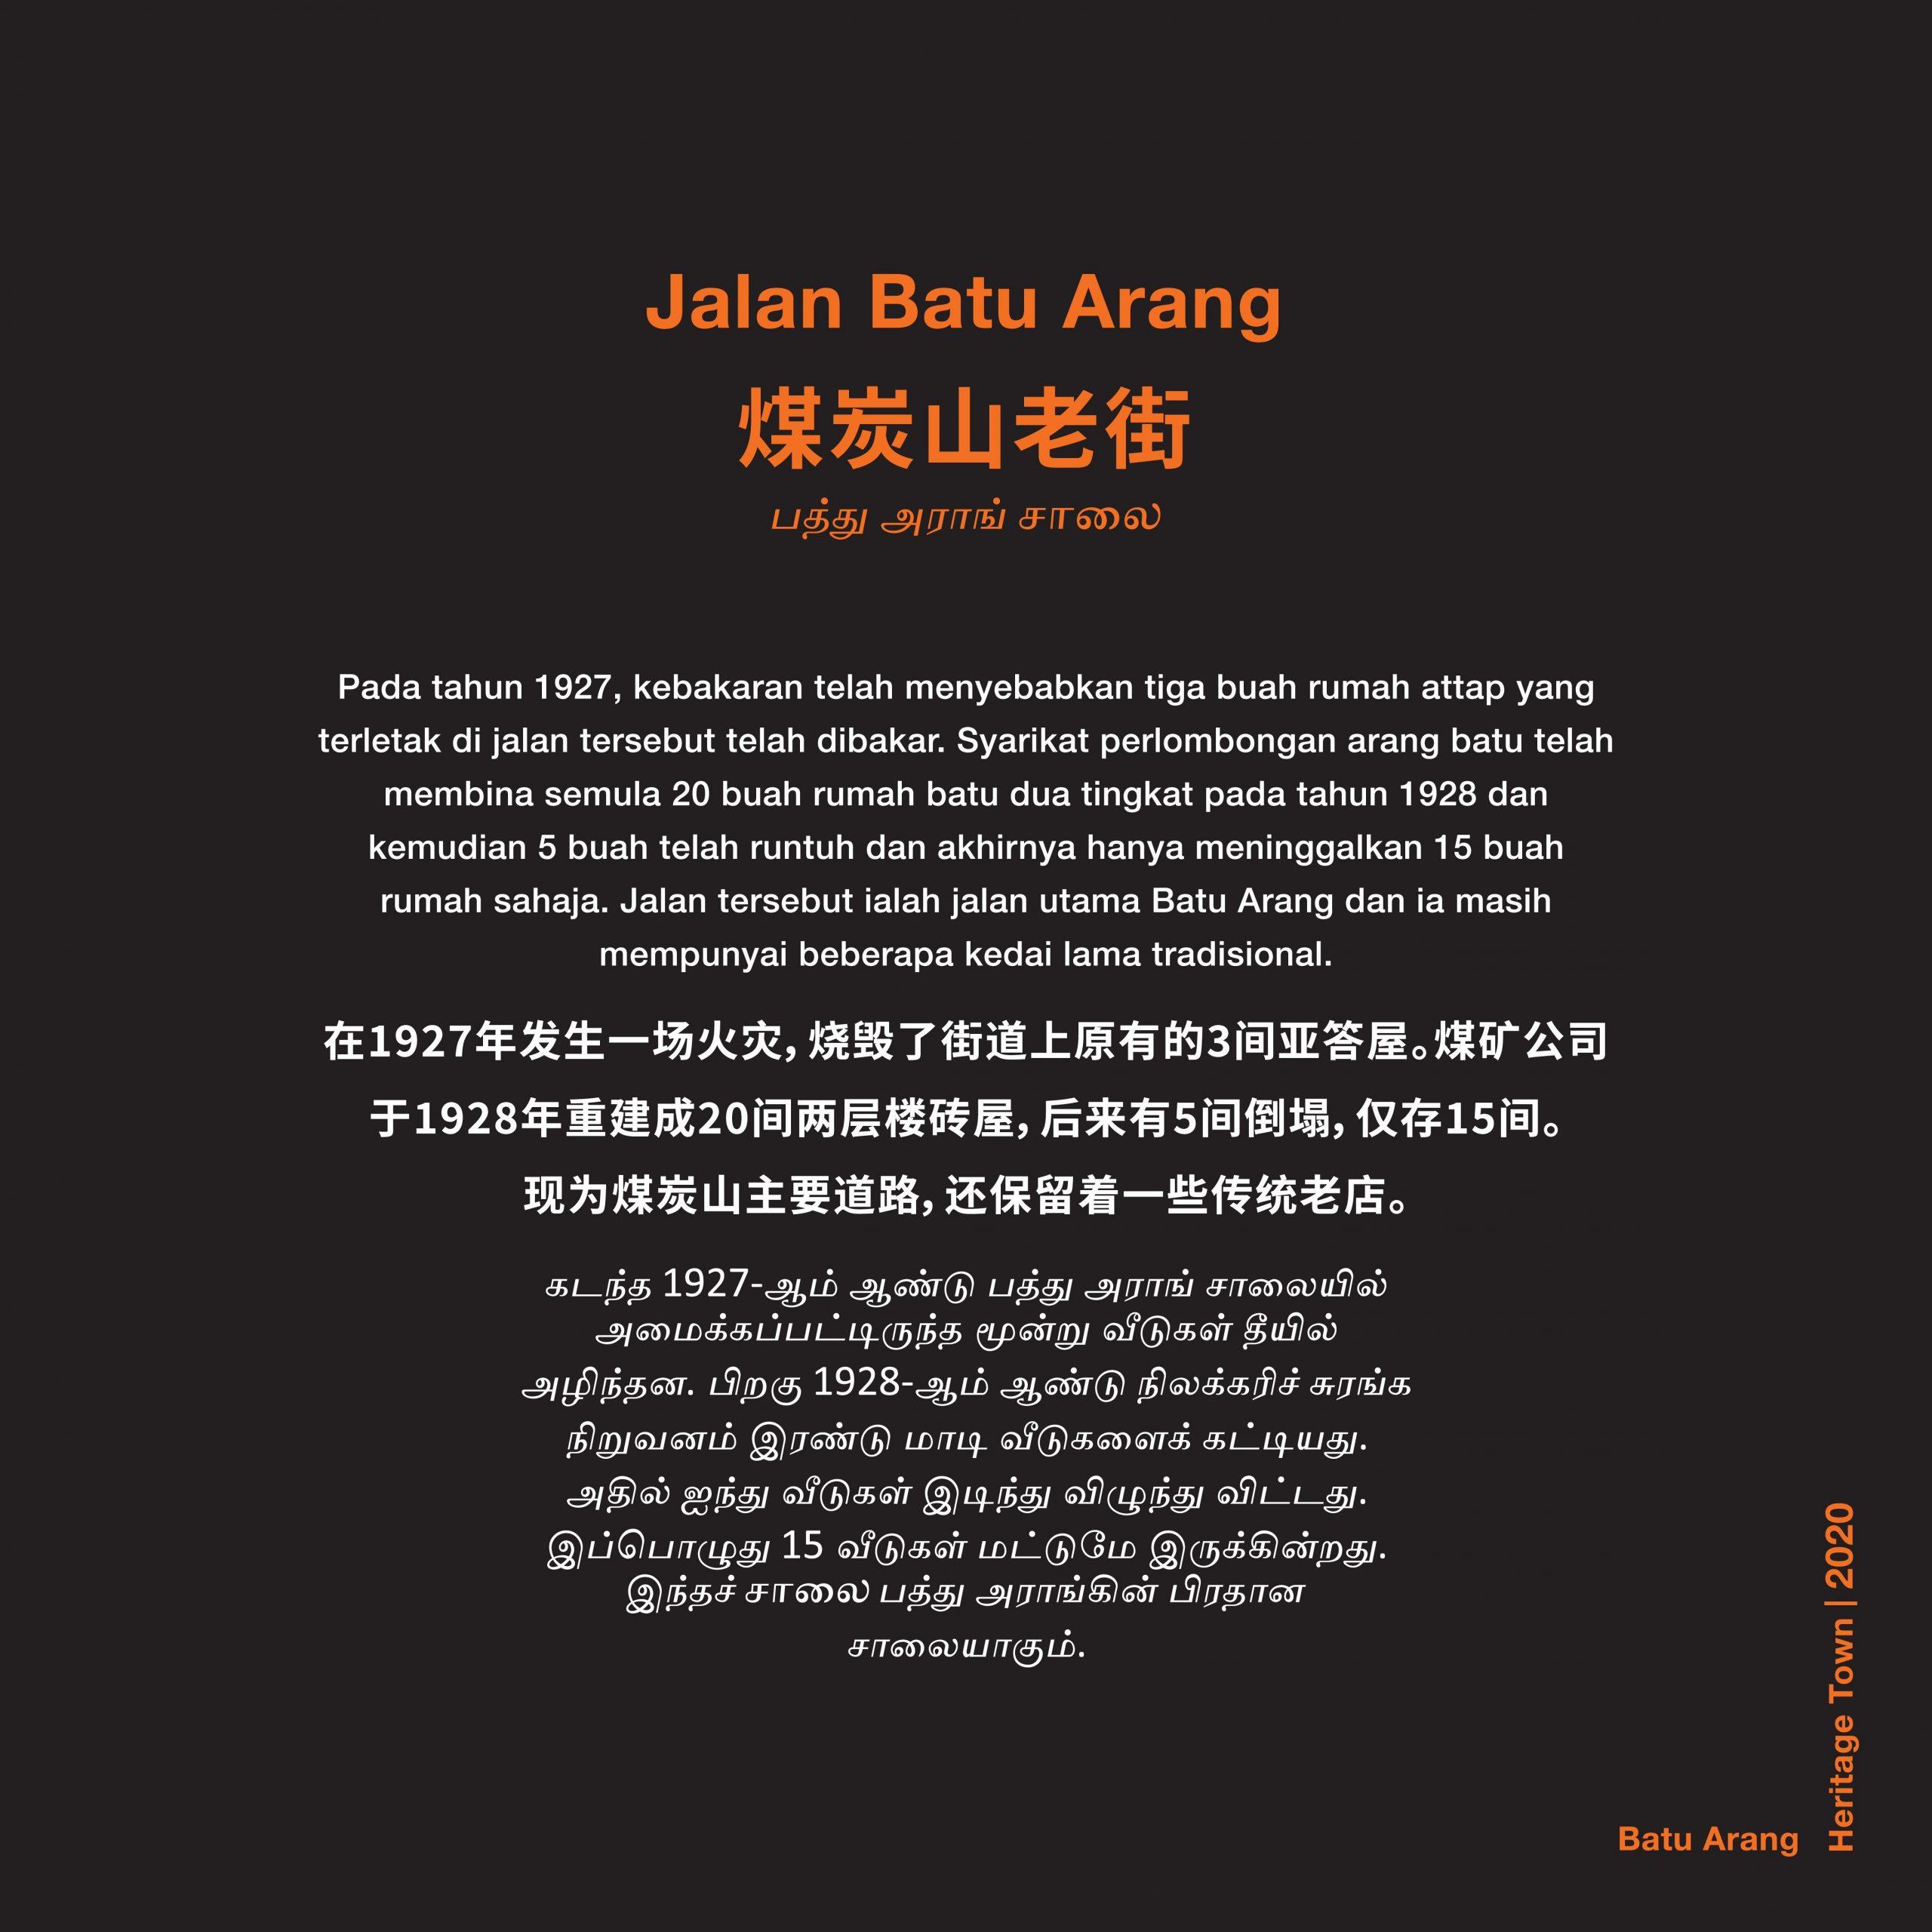 BatuArang-BuildingIntroduction-FAOL-04_00010